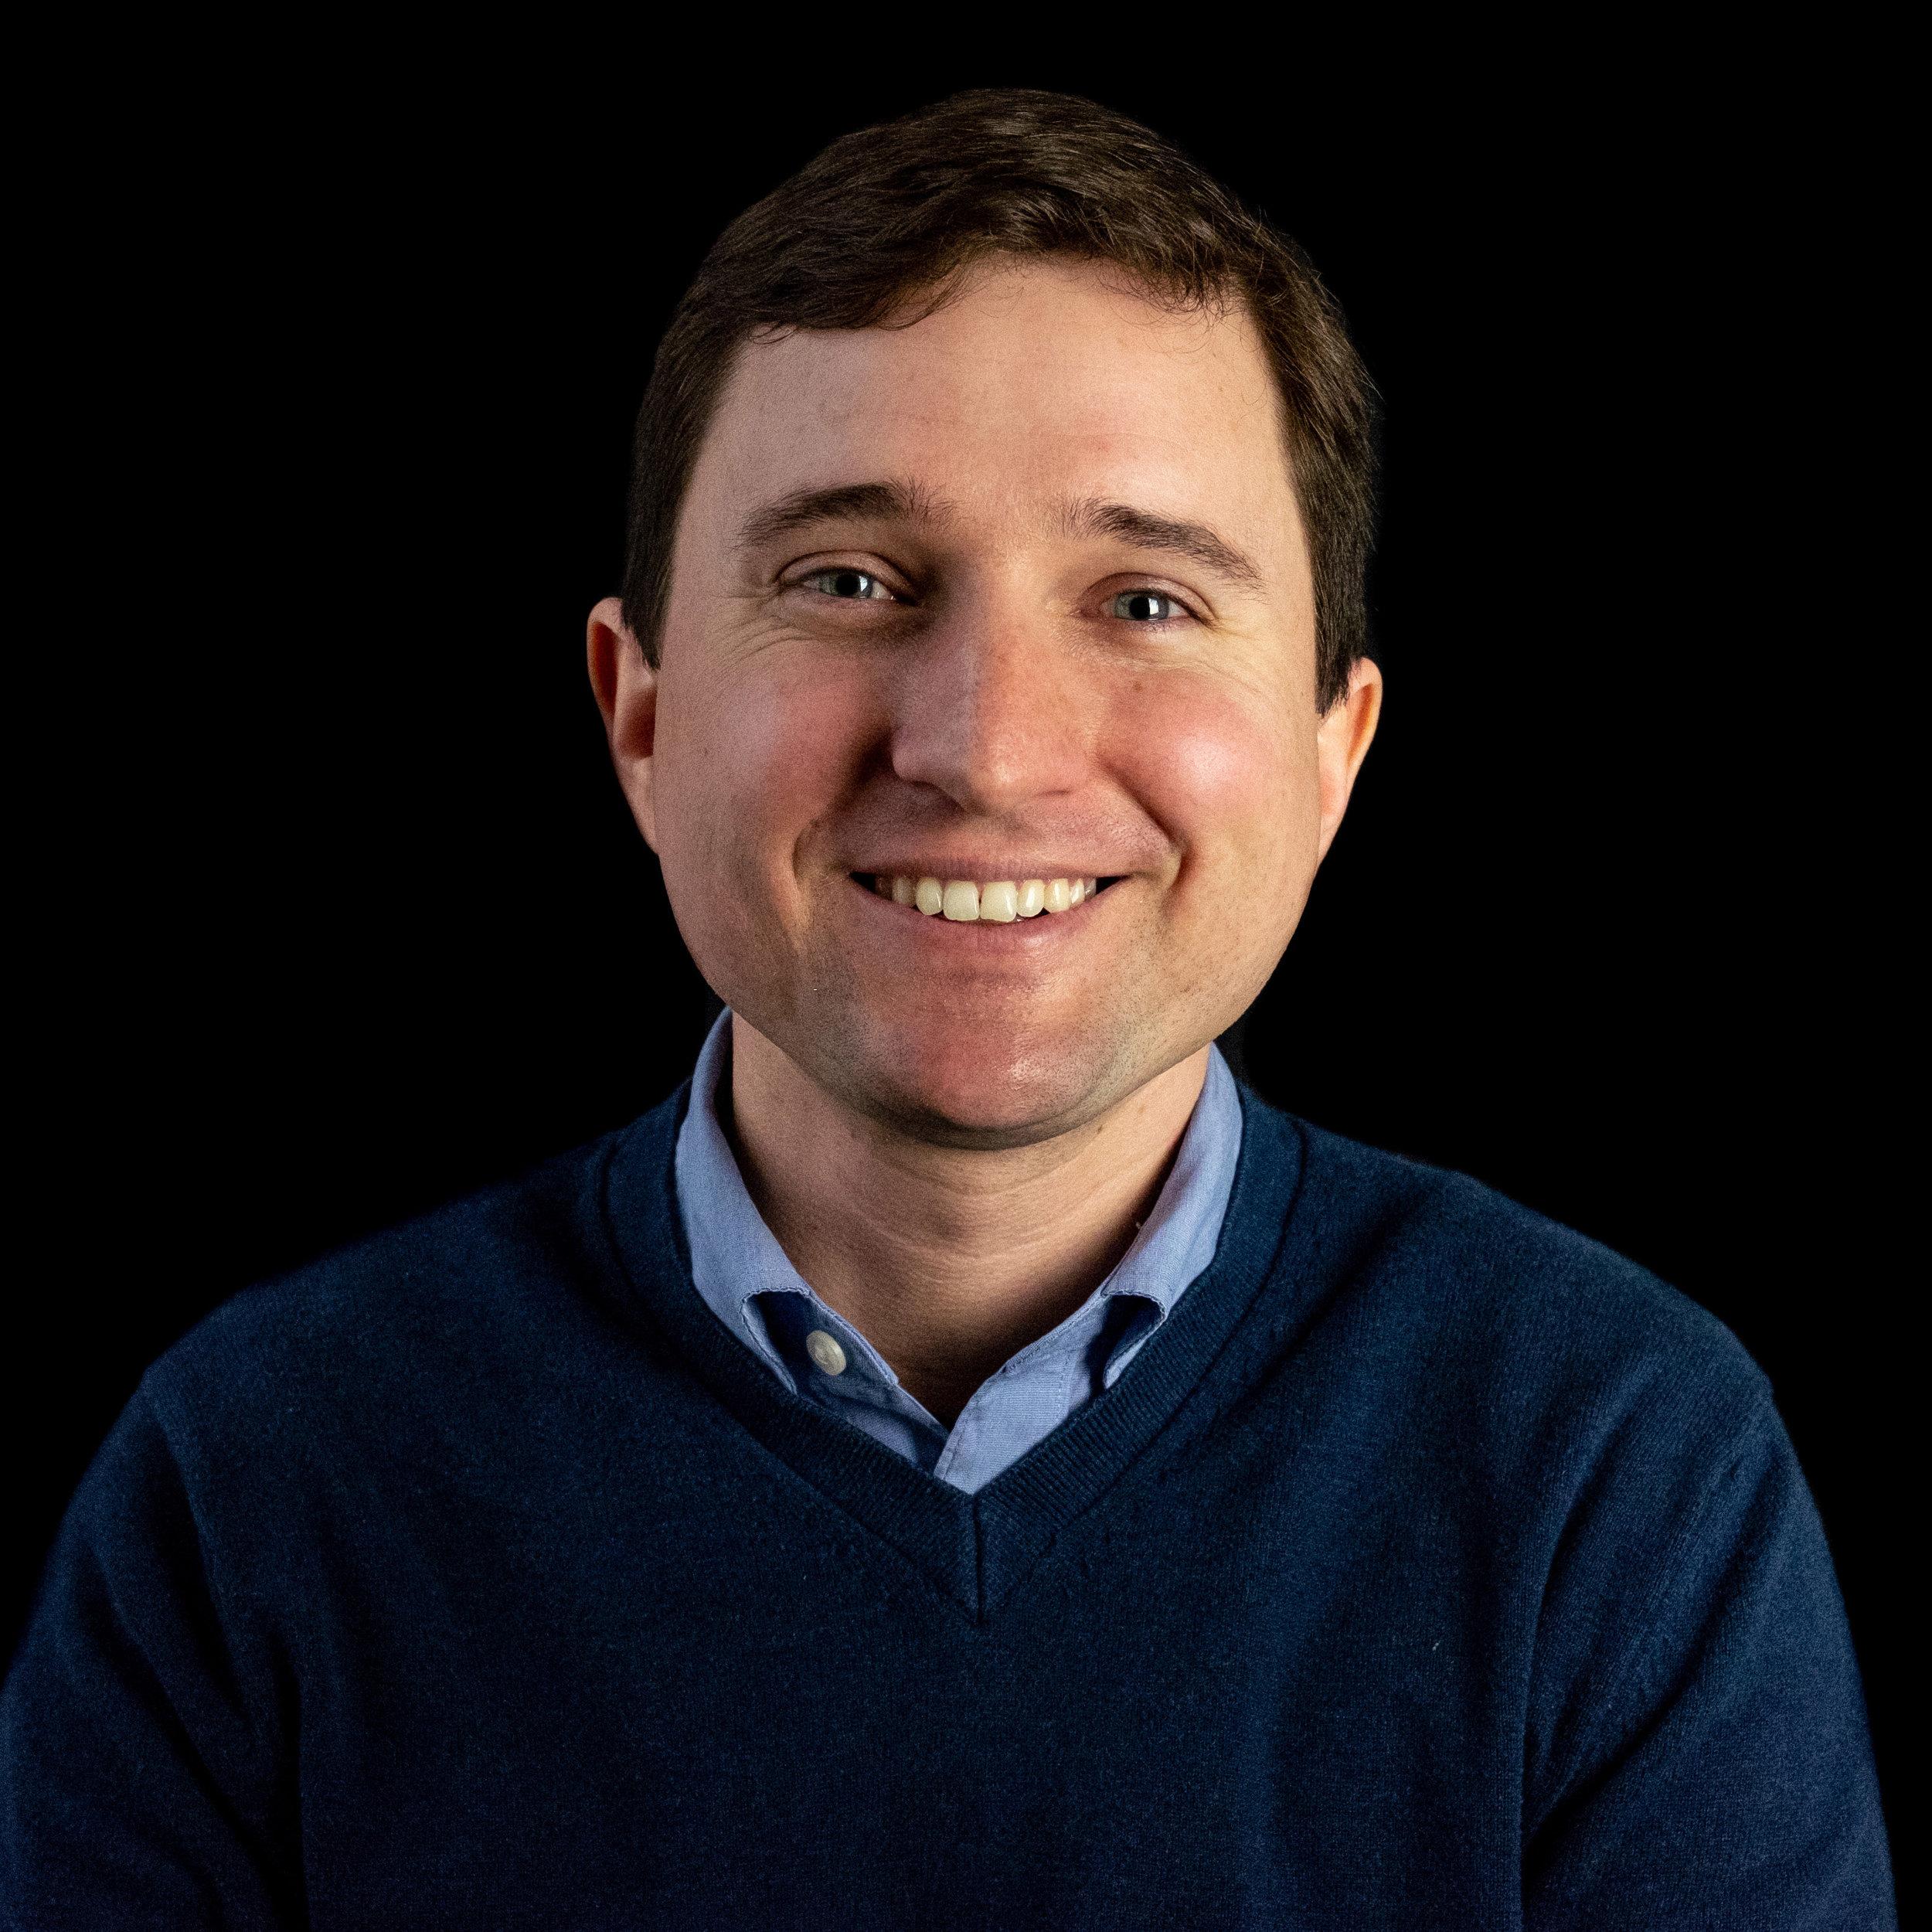 Ian Hippensteele Headshot Color.jpg